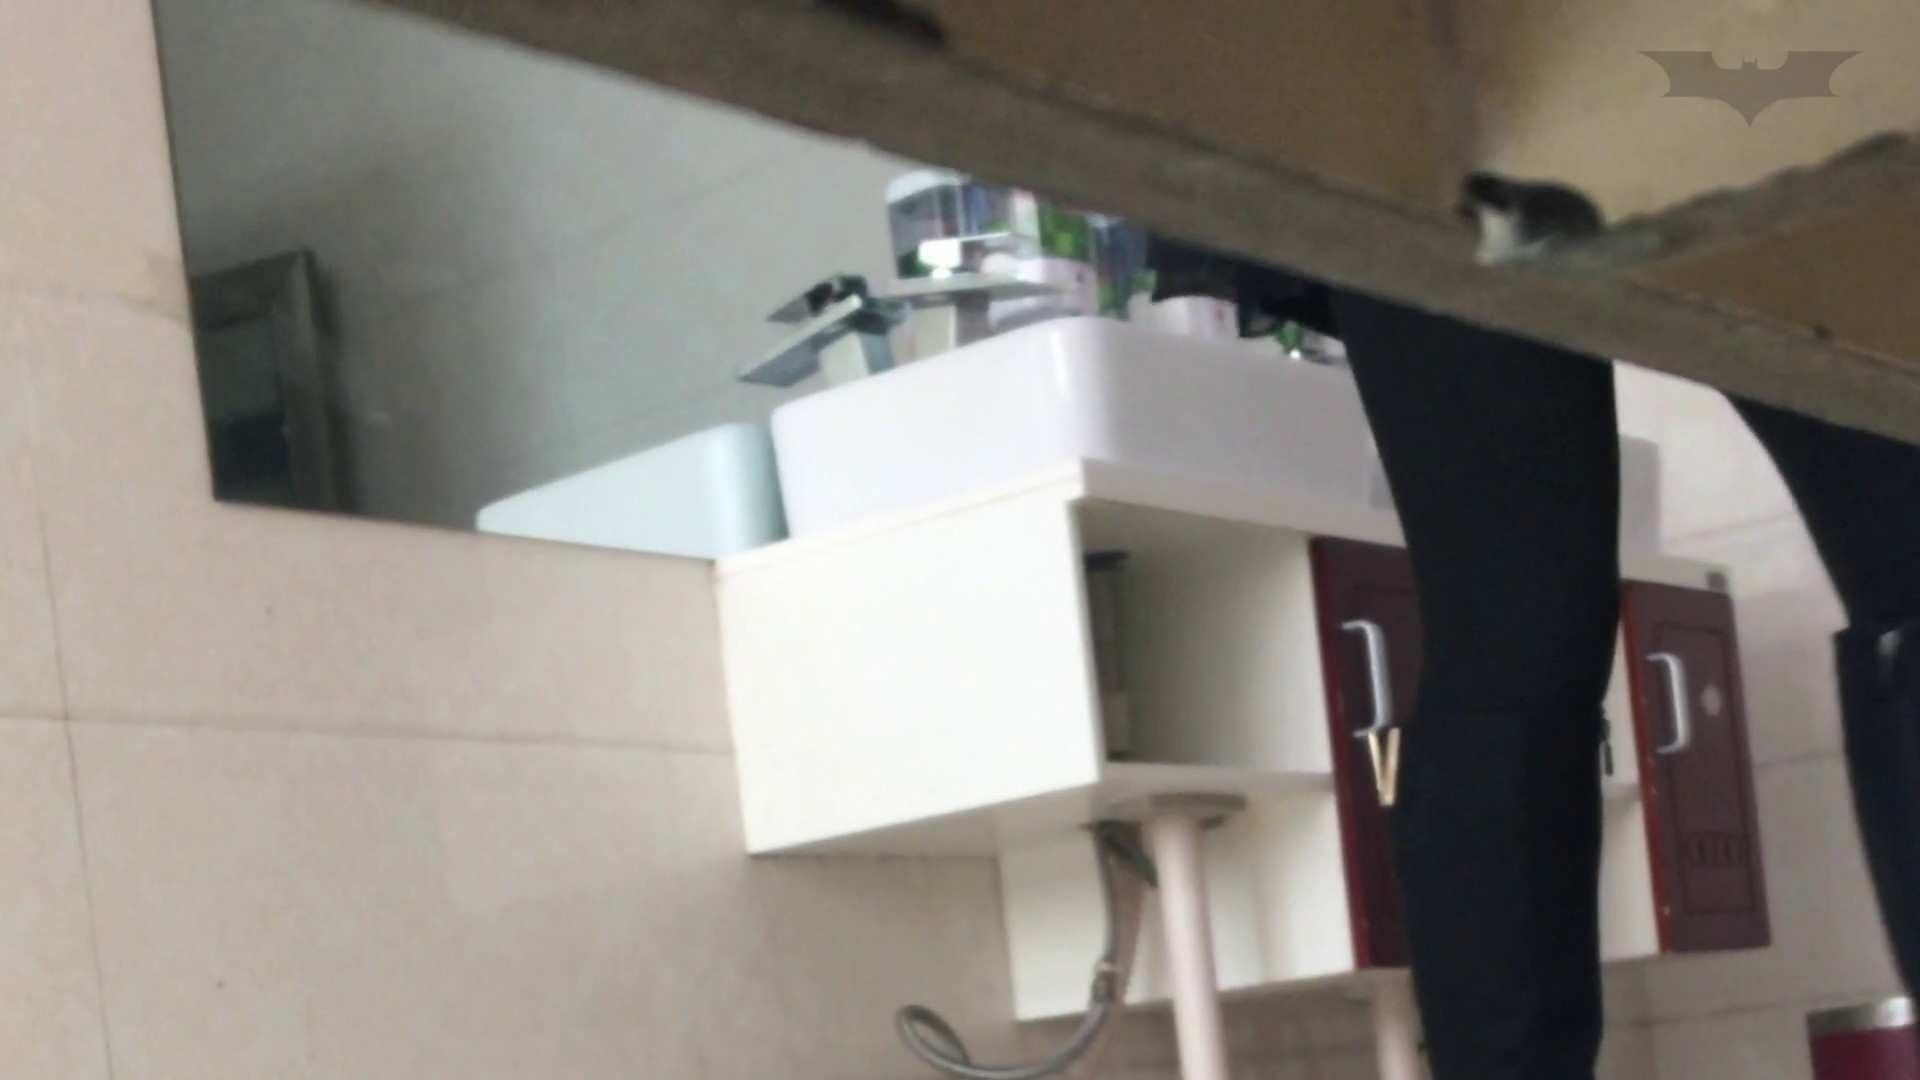 芸術大学ガチ潜入盗撮 JD盗撮 美女の洗面所の秘密 Vol.114 美肌 エロ無料画像 50画像 5